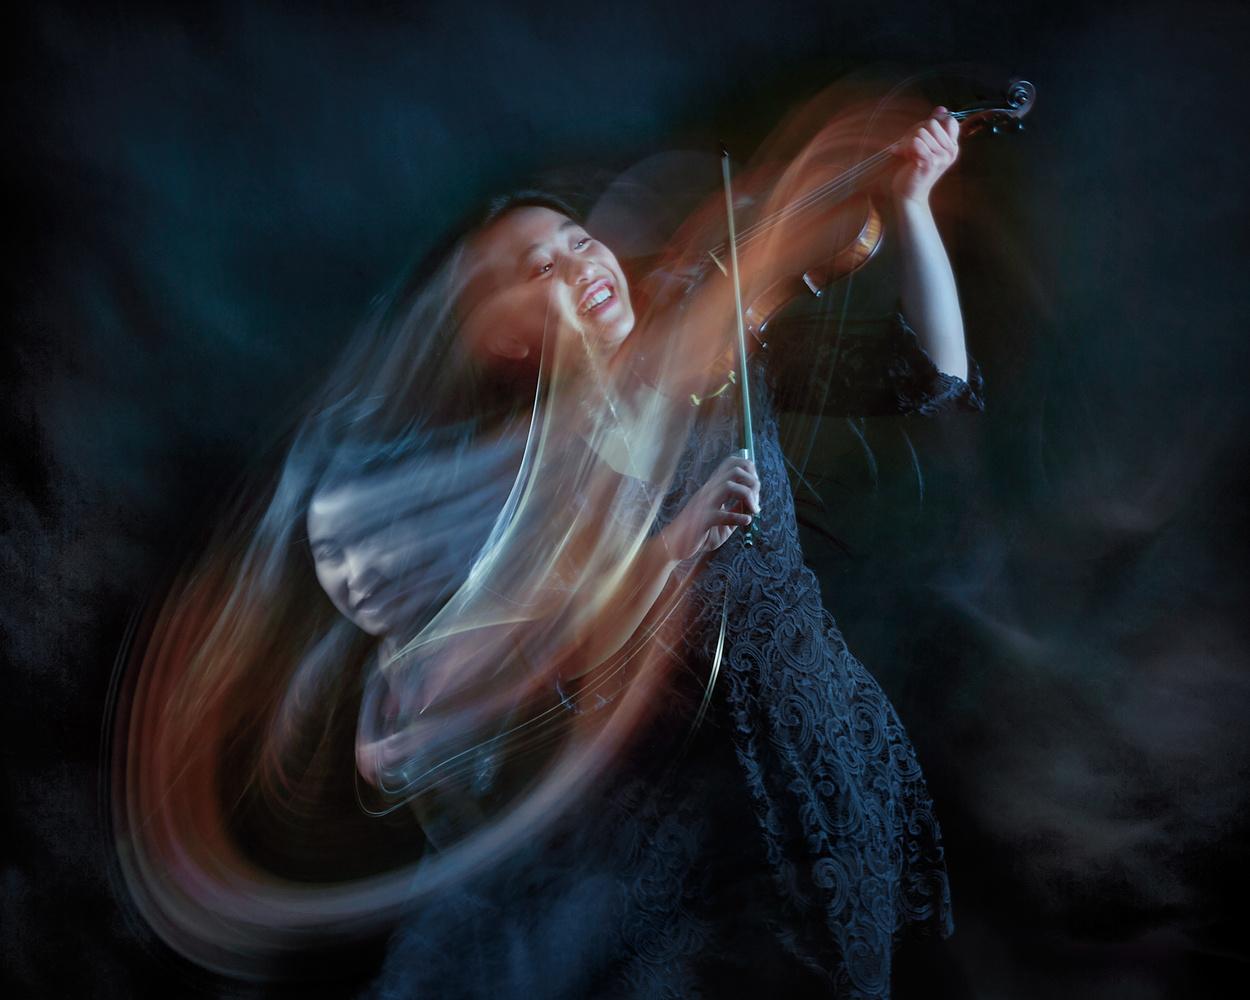 Music in Motion by Hank Rintjema